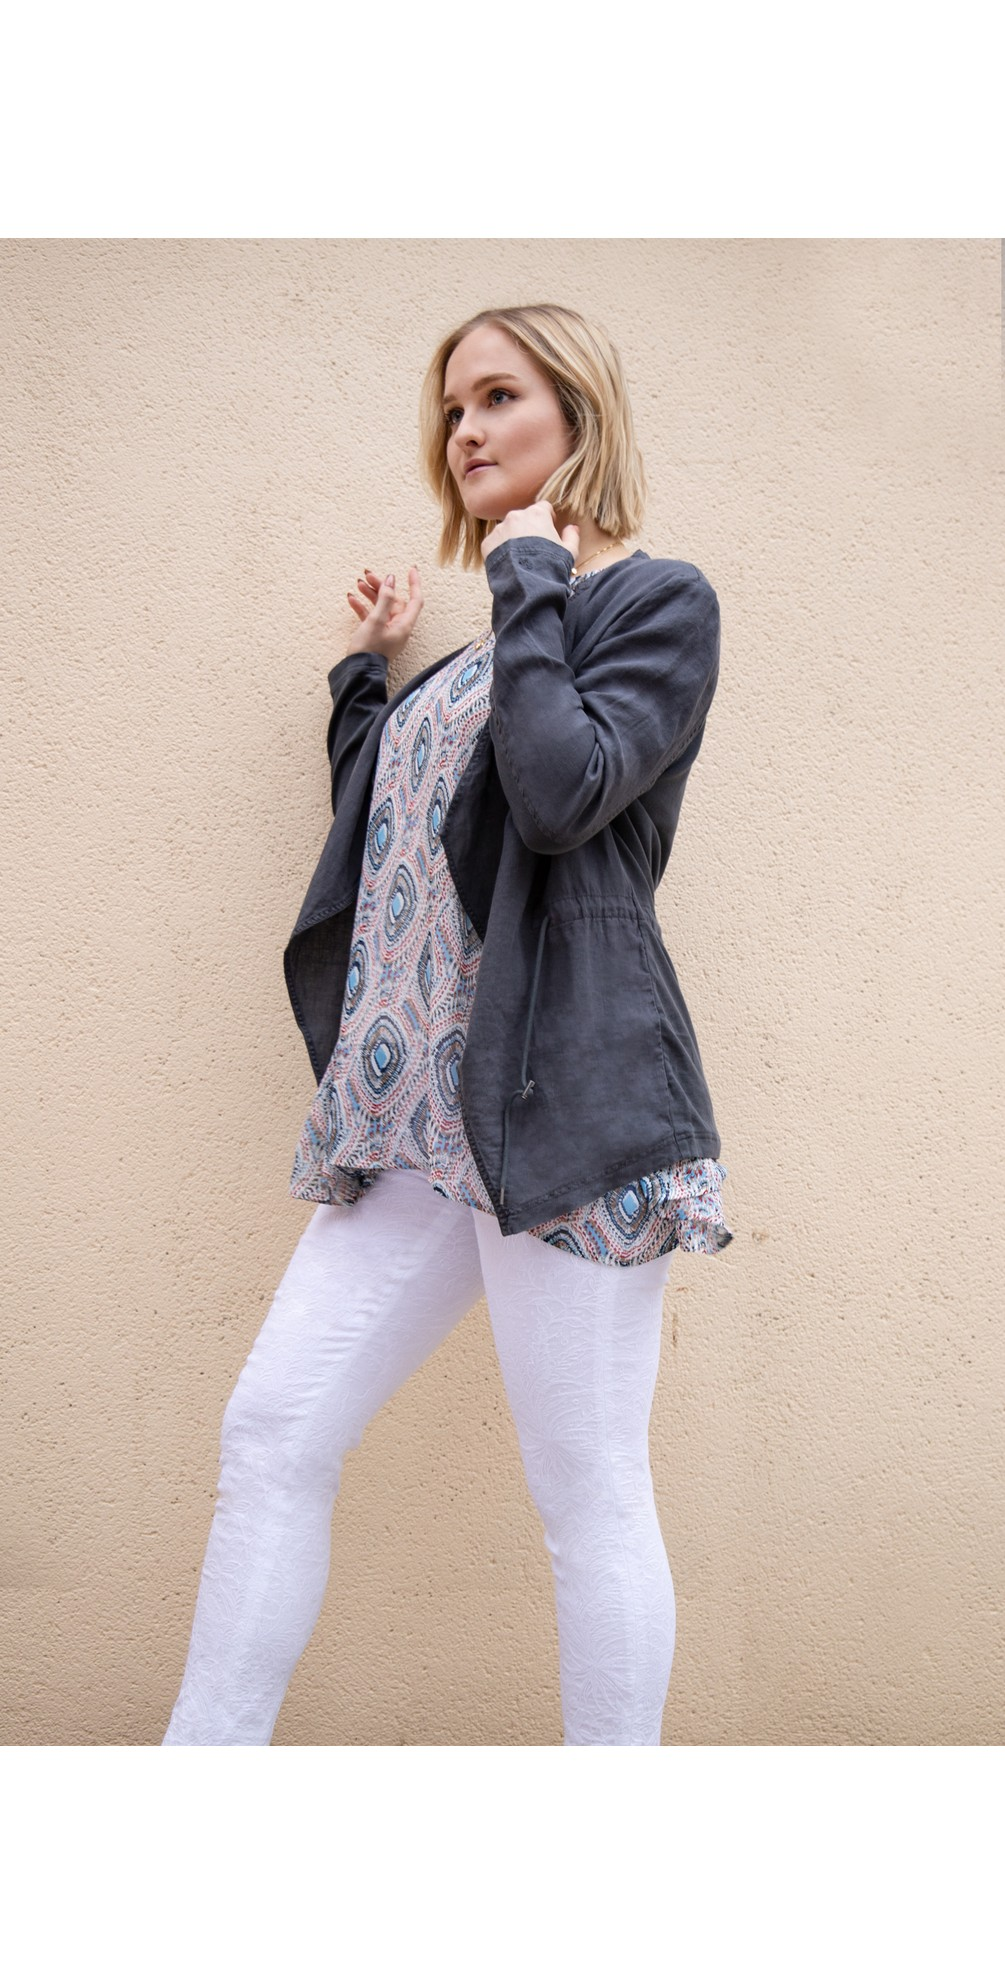 Rose 09 White Ankle Length Jacquard Slimfit Trouser main image